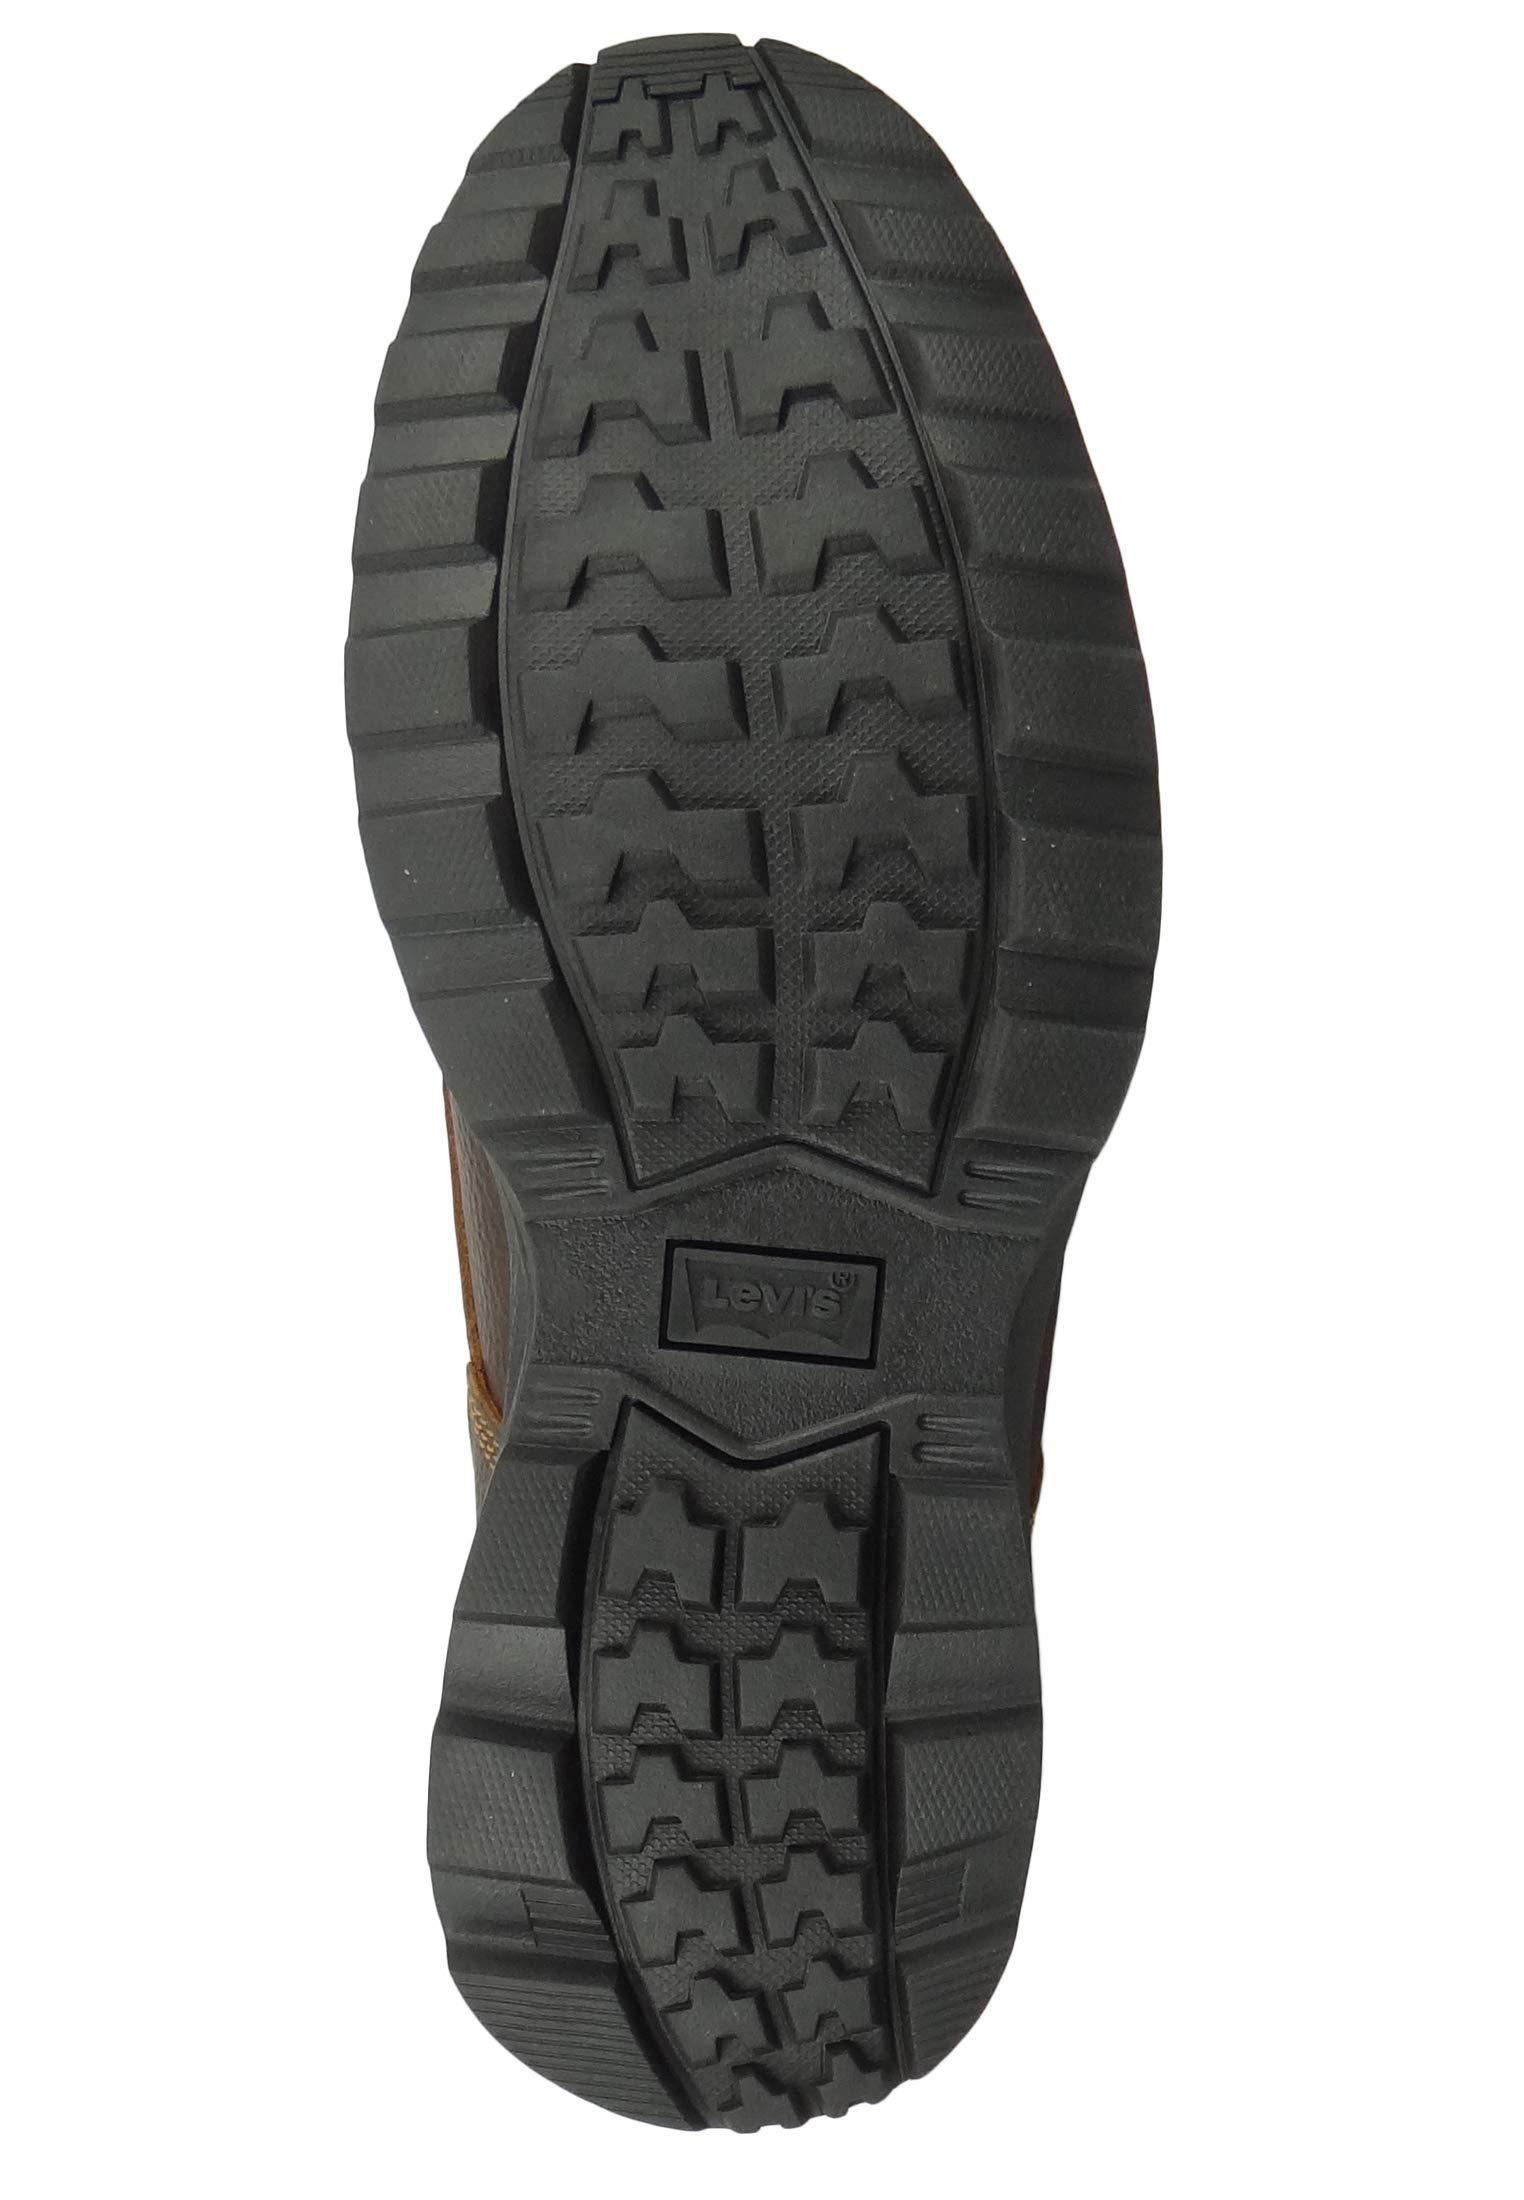 Levi's Arrowhead 228777-829-128 Men's Walking Boots Brown 6